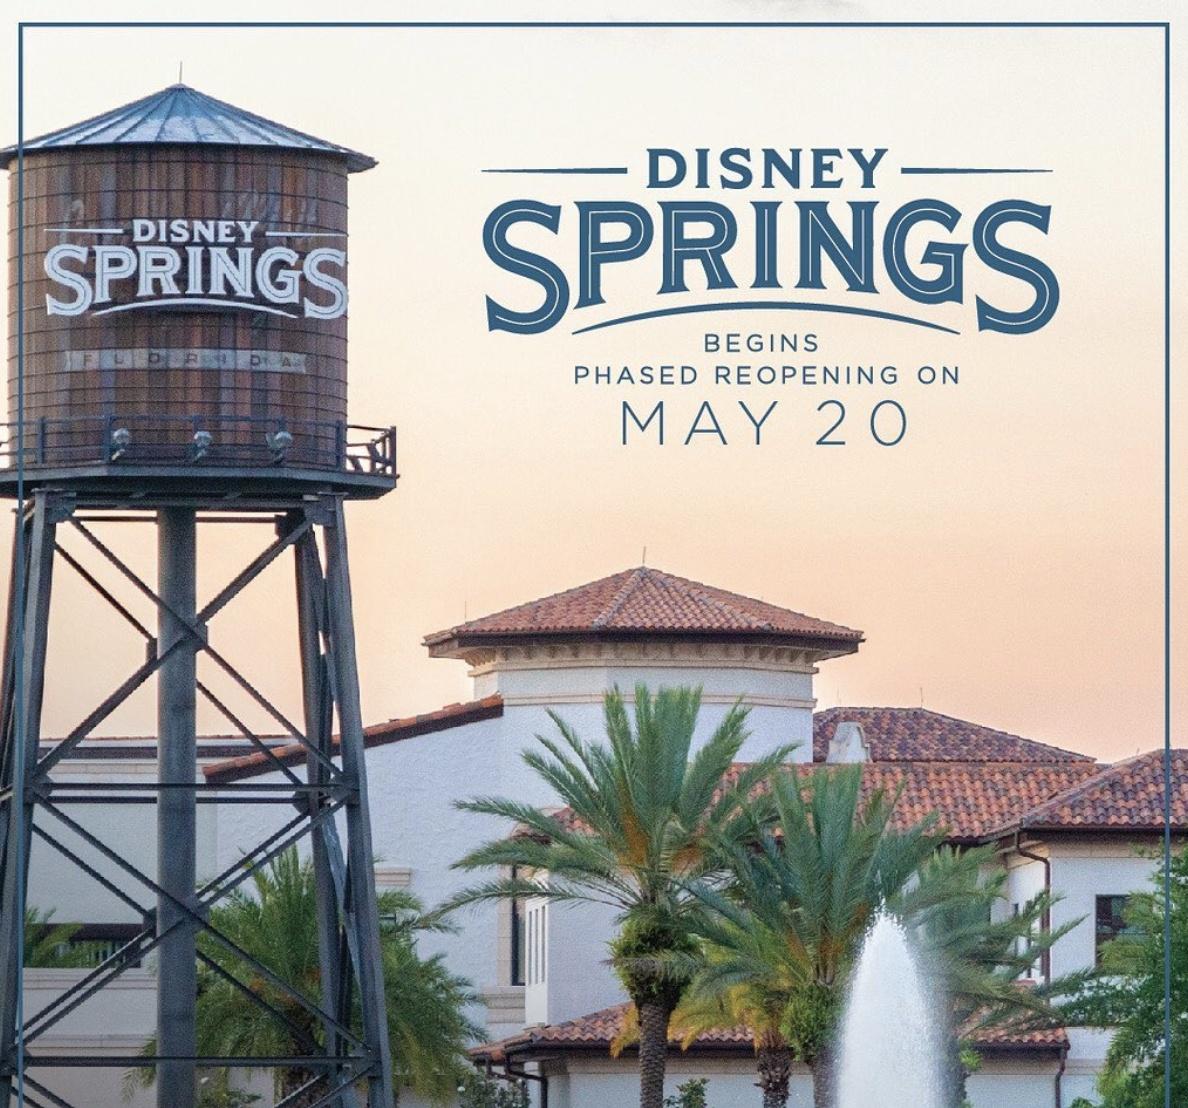 Disney Springs of Orlando